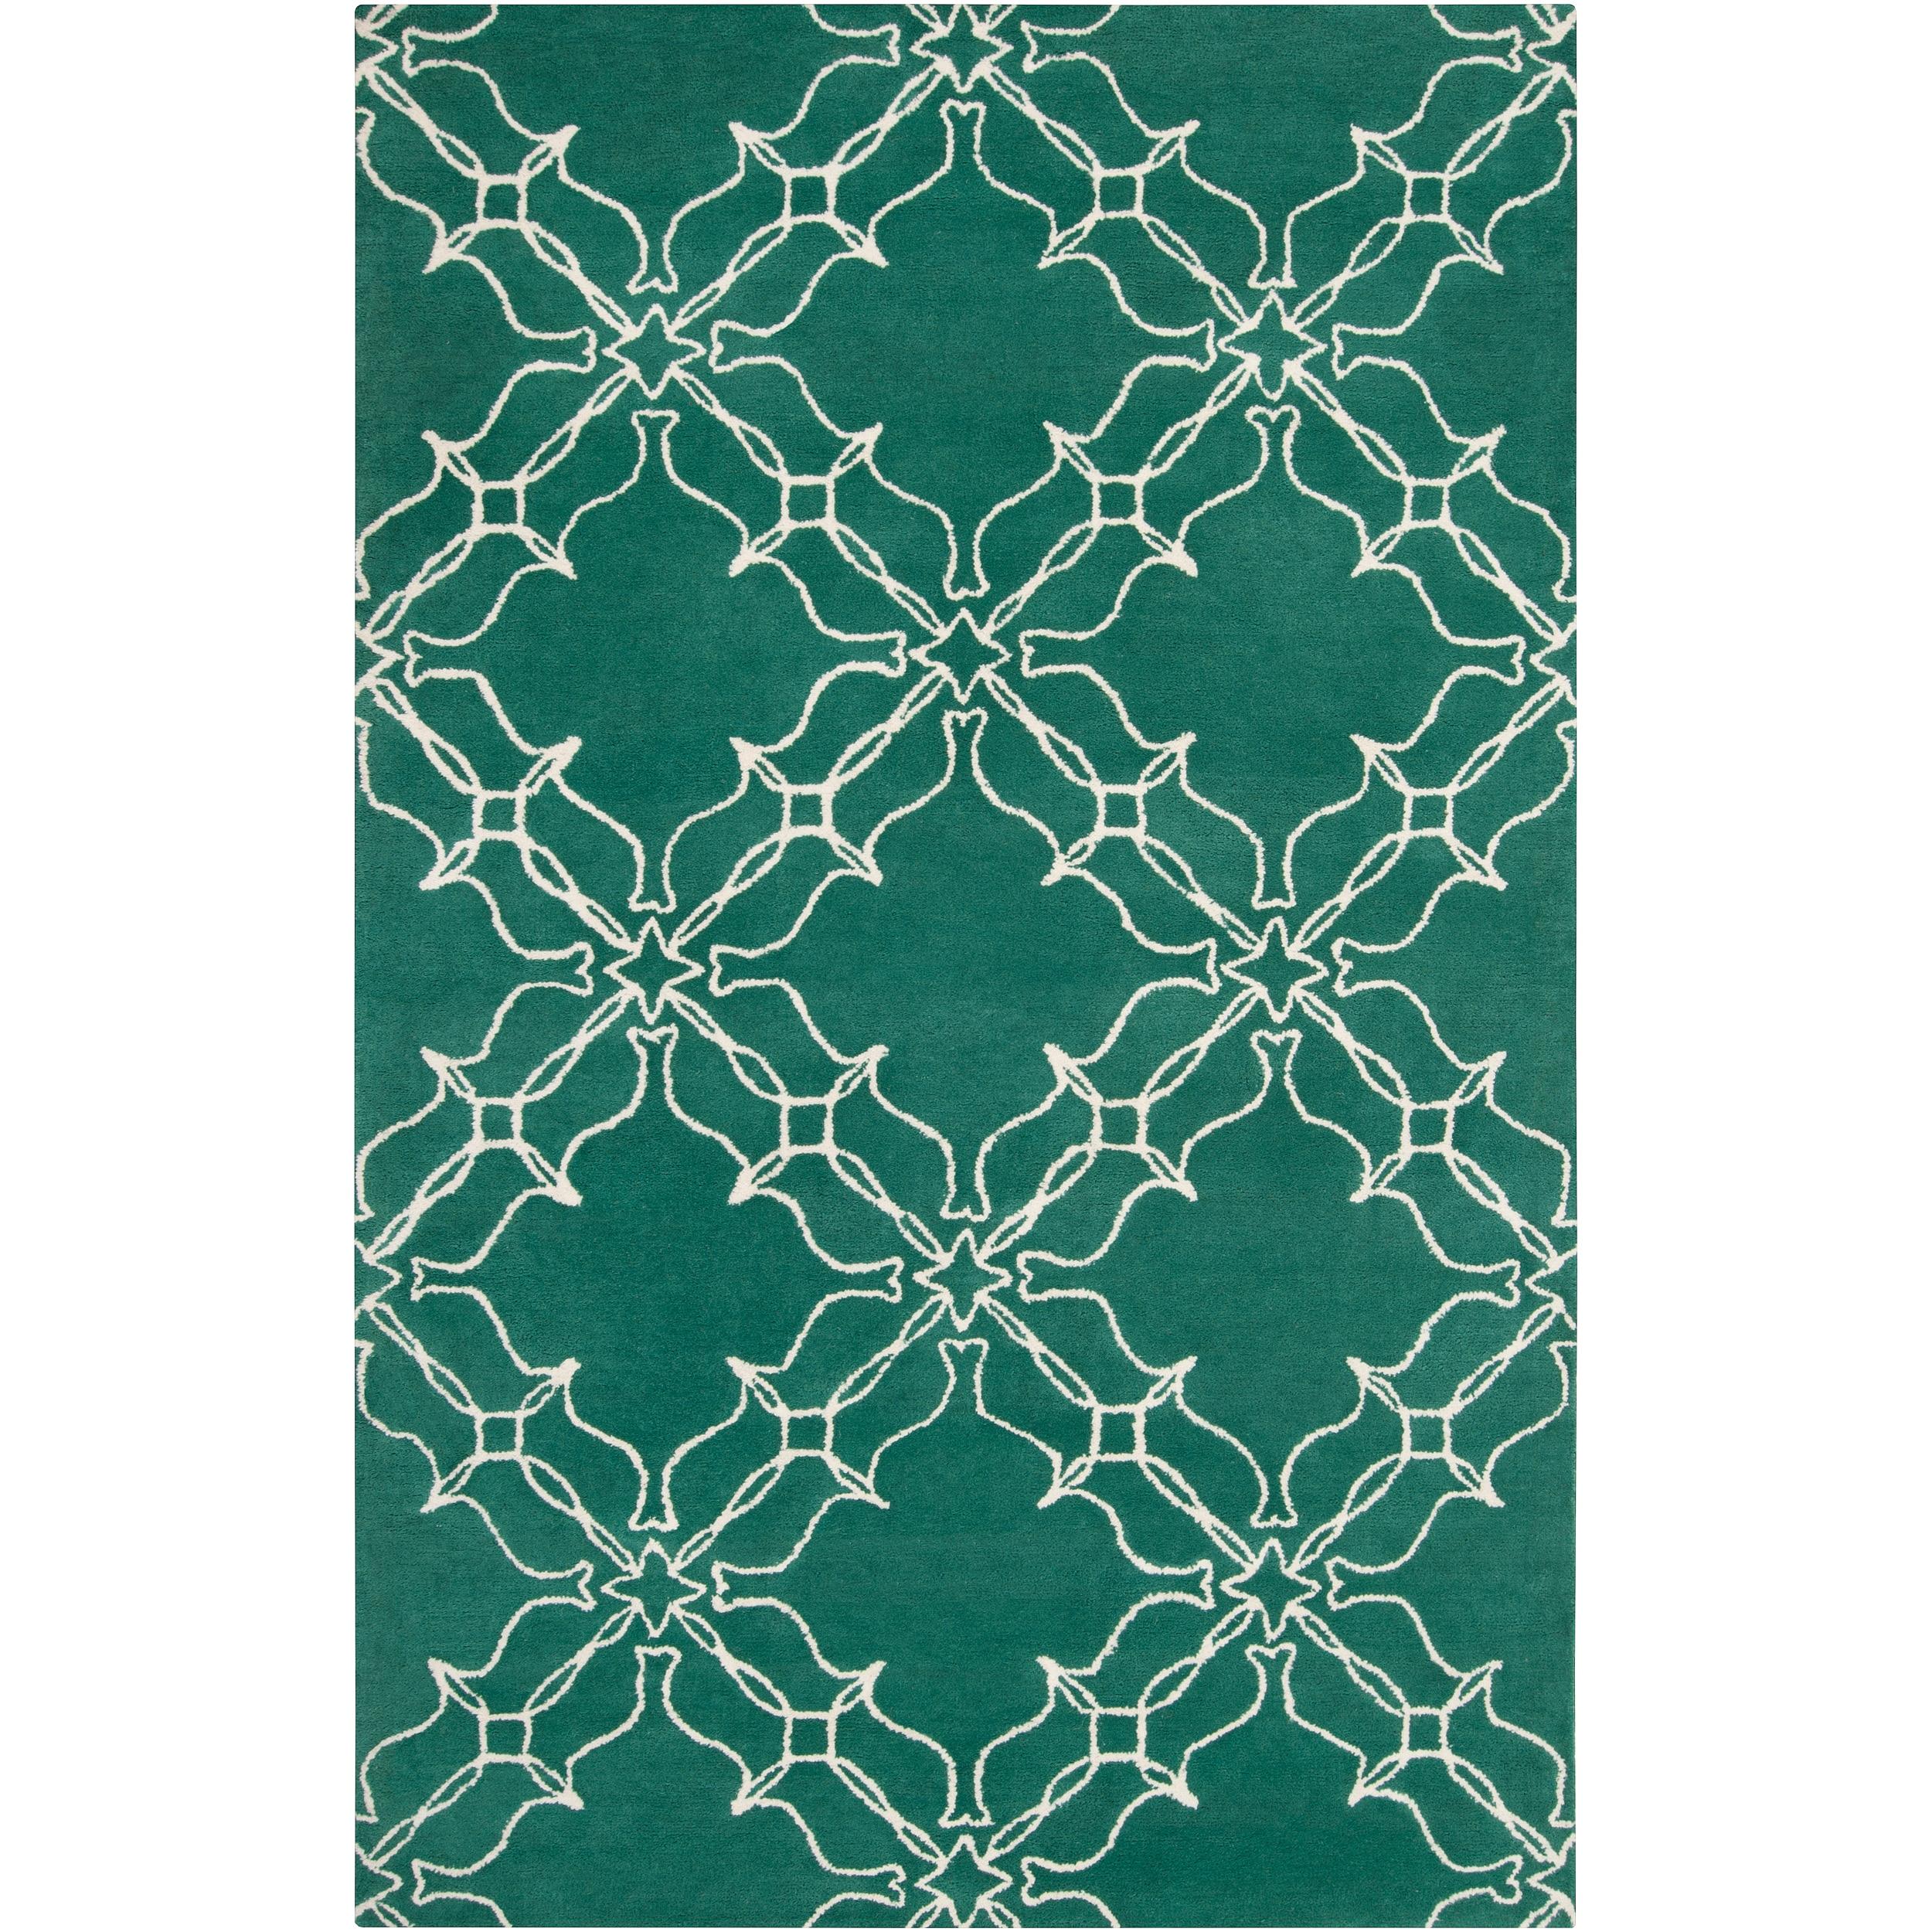 Aimee Wilder Hand-Tufted Green Courland Geometric Trellis Wool Area Rug (5' x 8')